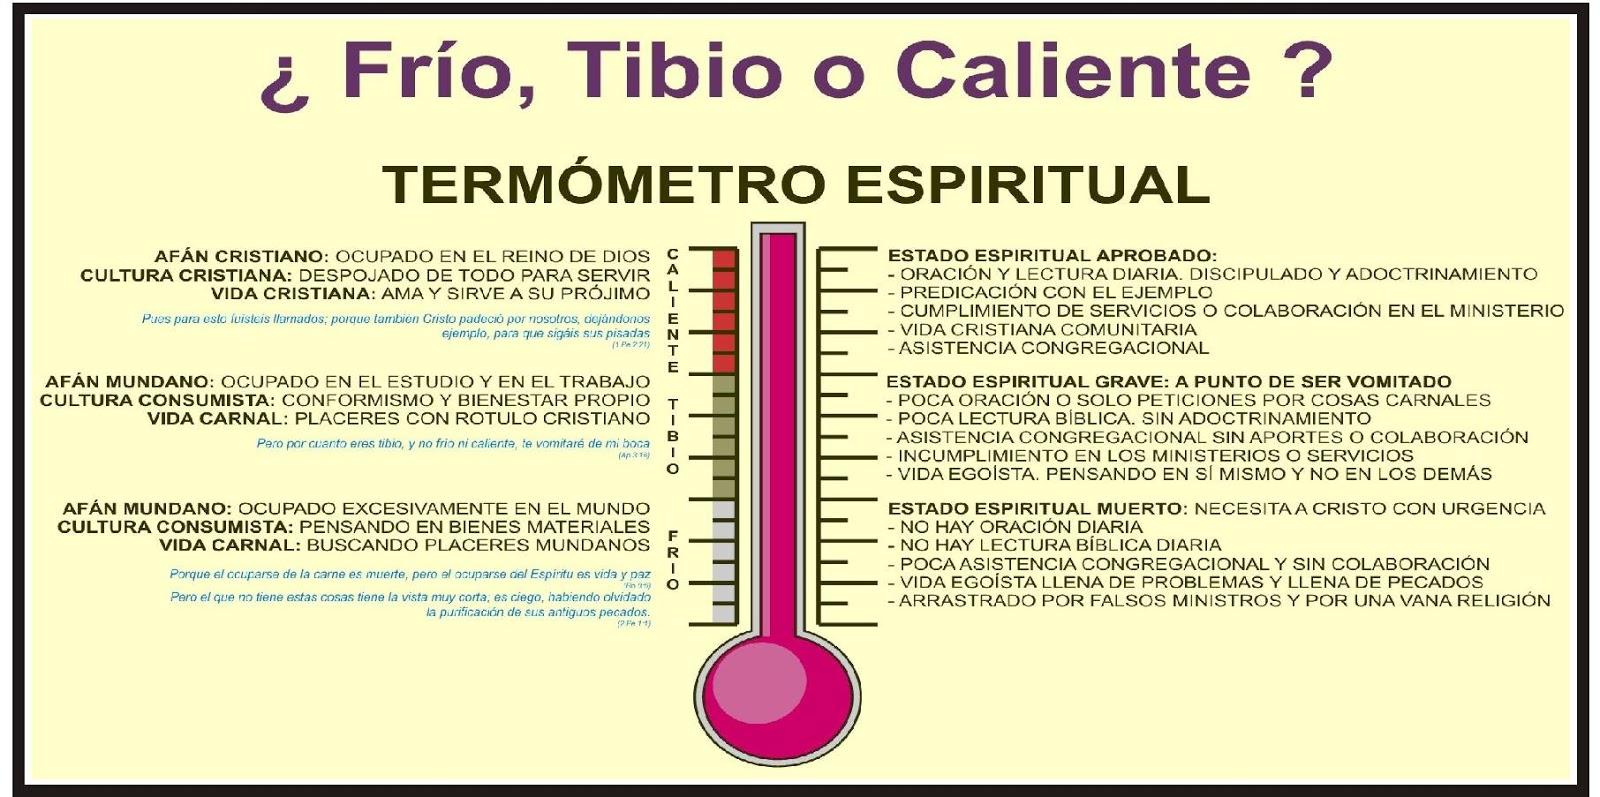 El Aborrecible Estado De Tibieza Parte 1 Iglesia Biblica En Salta Il termometro a lettura istantanea offre una lettura digitale della temperatura veloce e precisa. iglesia biblica en salta